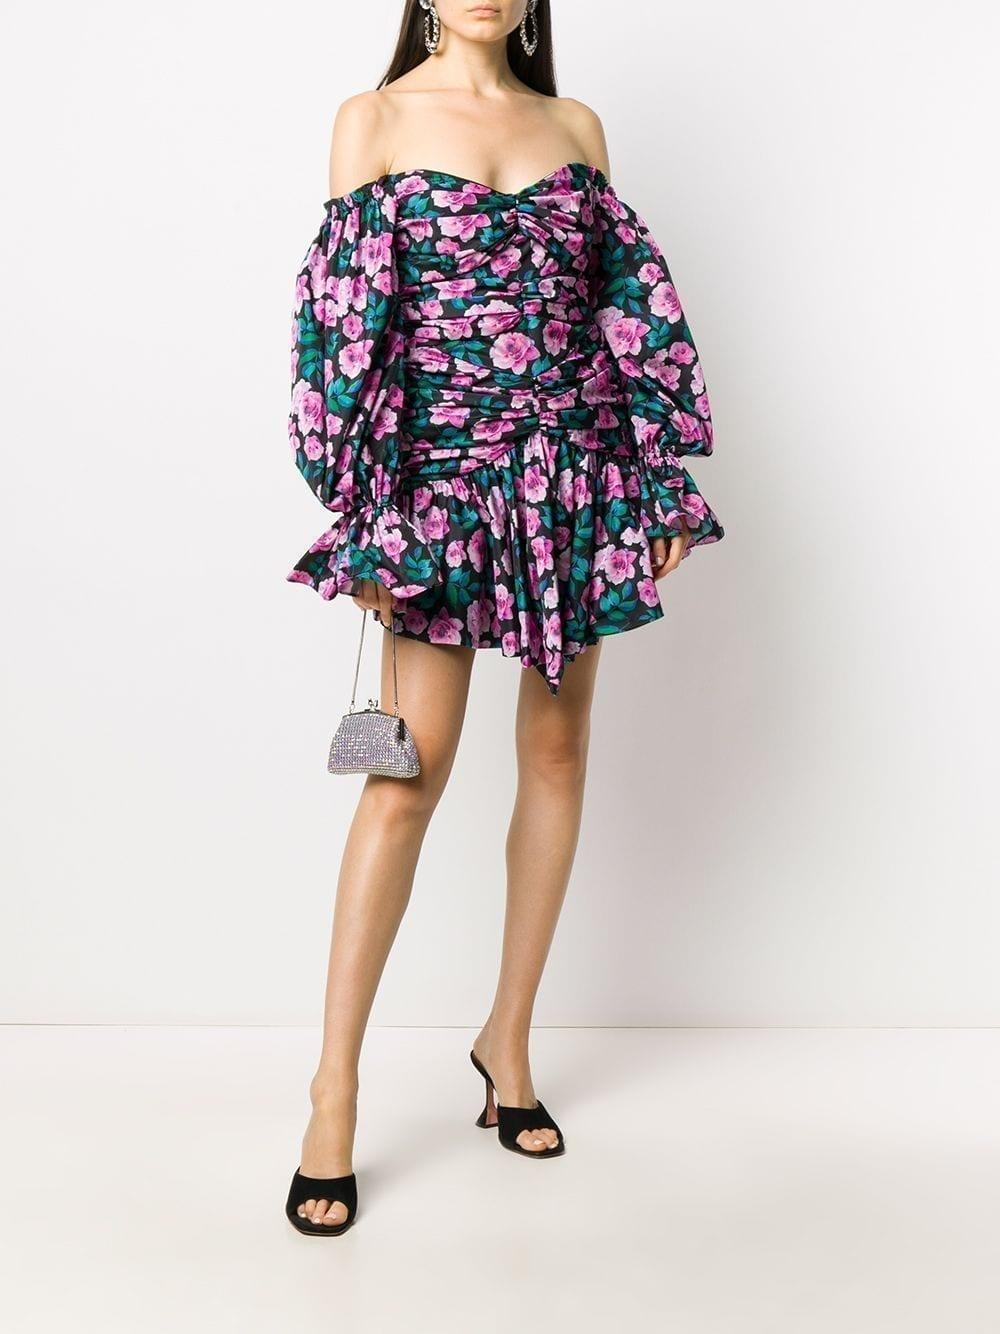 GIUSEPPE DI MORABITO Off-shoulder Floral Print Dress